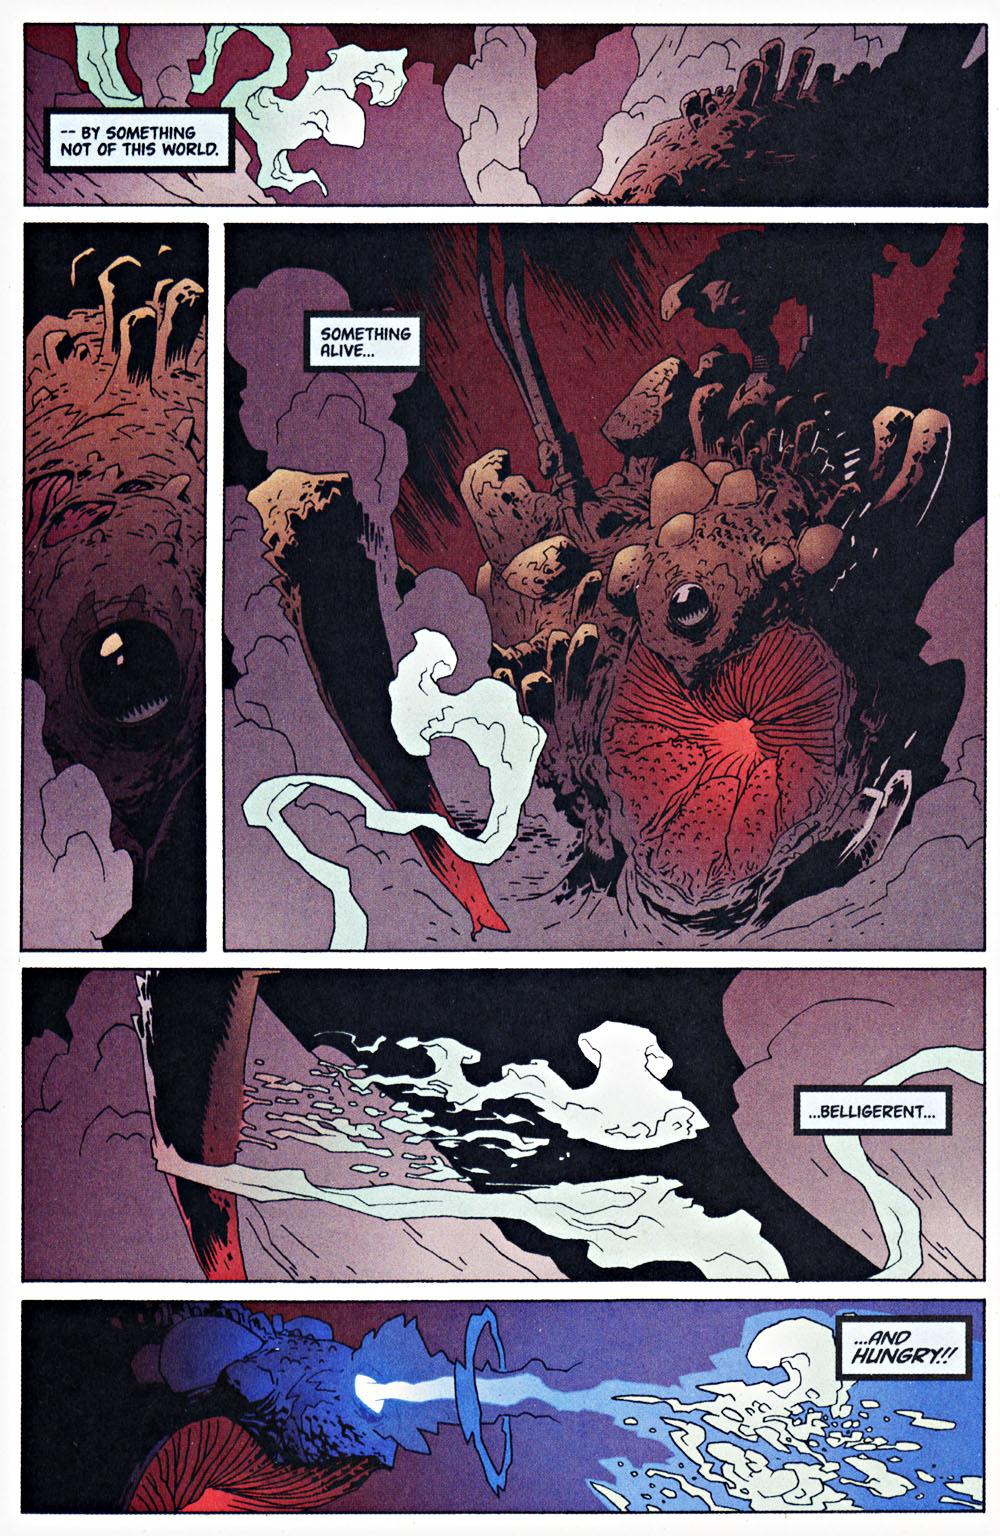 Read online Hellboy: Weird Tales comic -  Issue #7 - 24